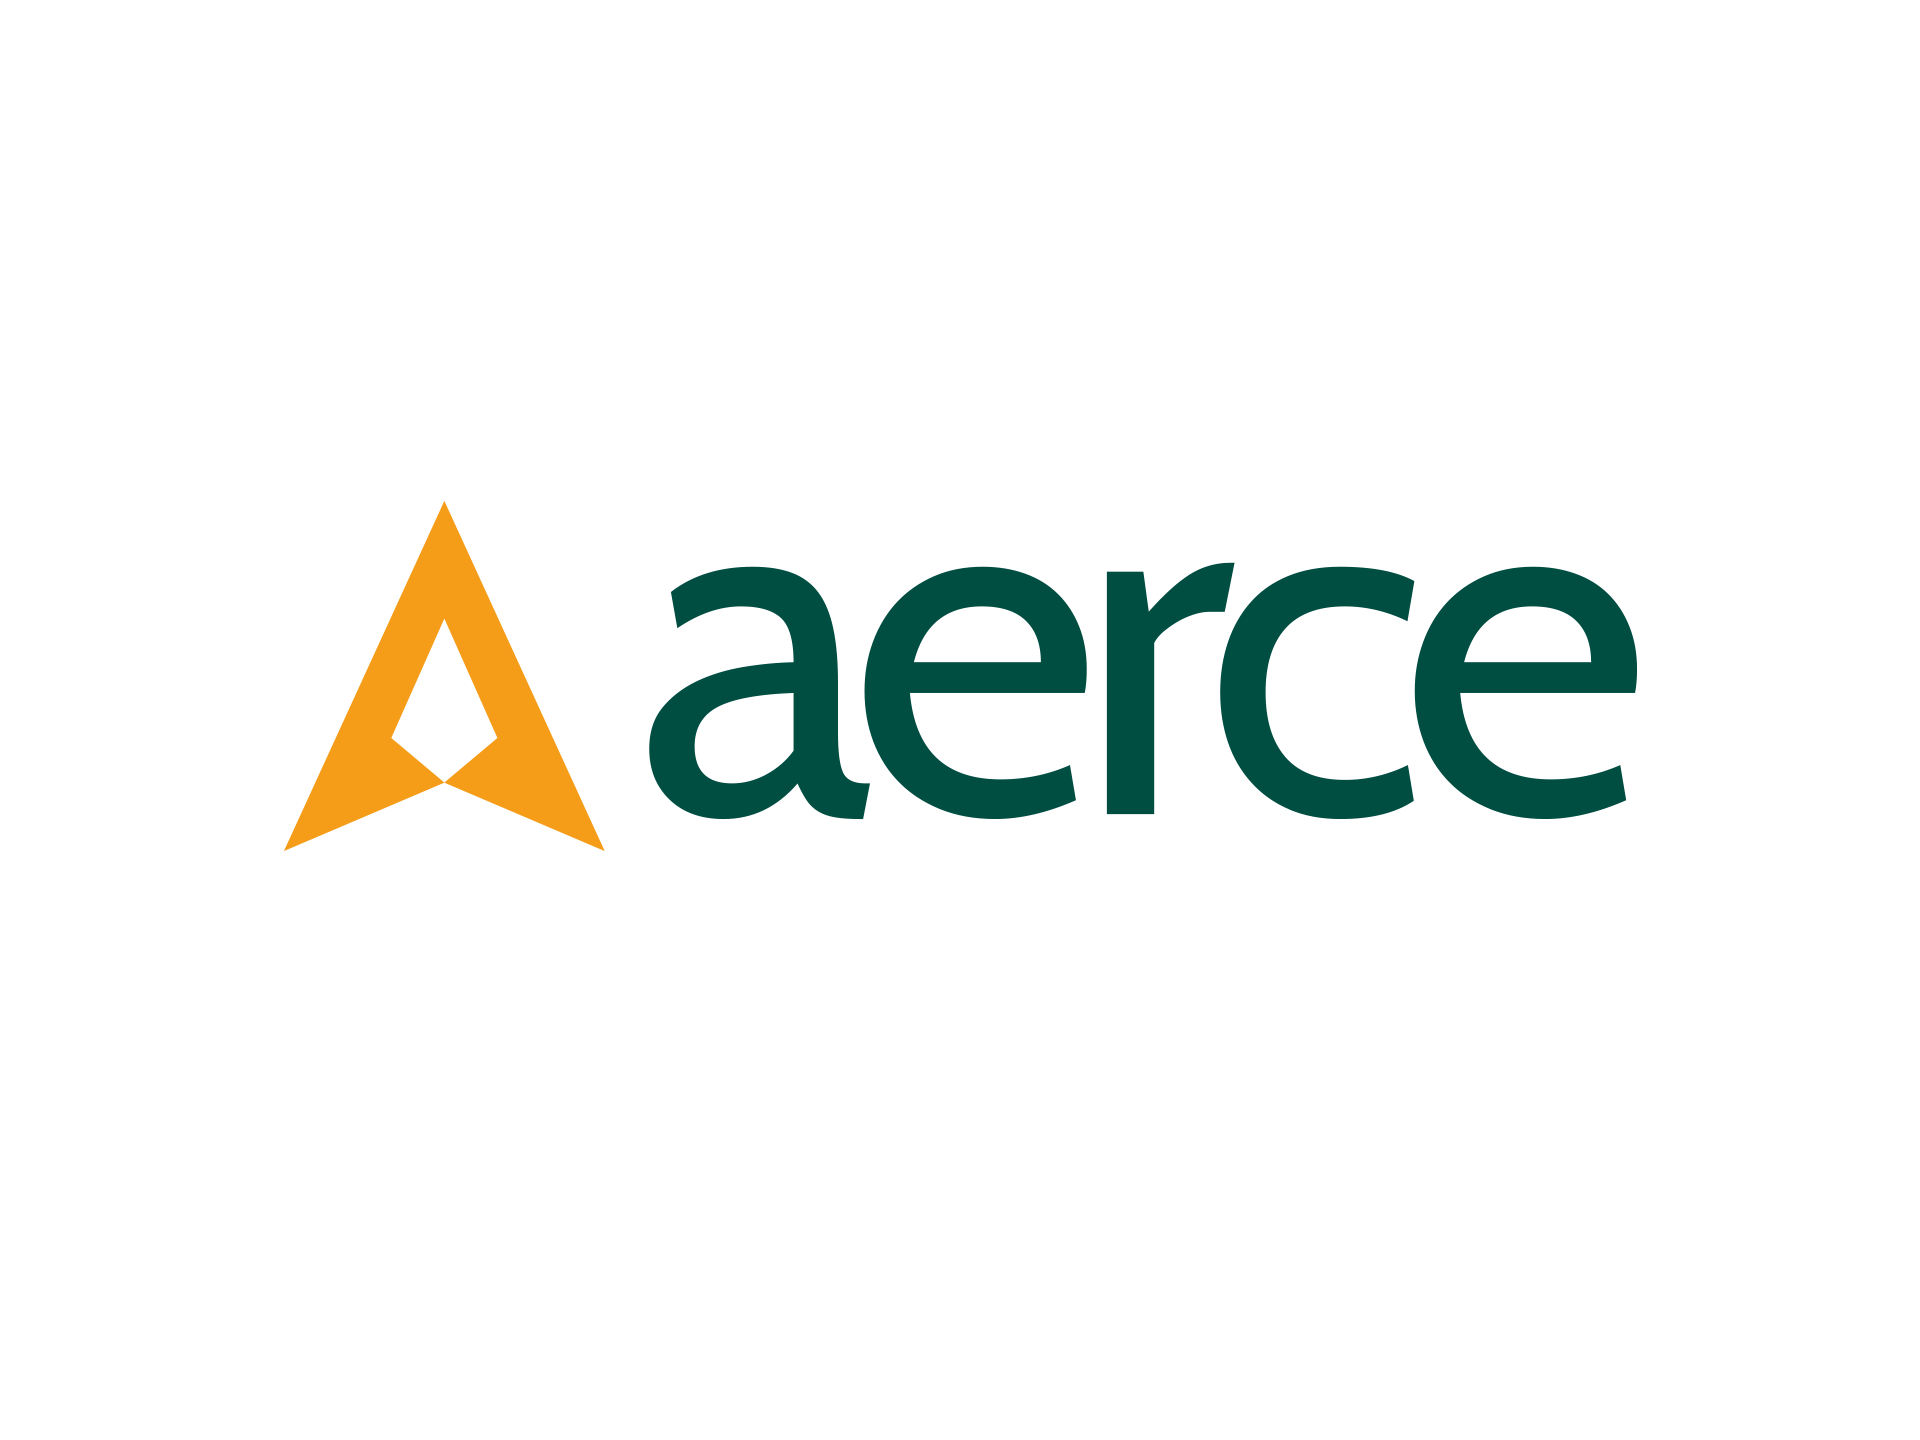 CANAL AFELIN- AERCE